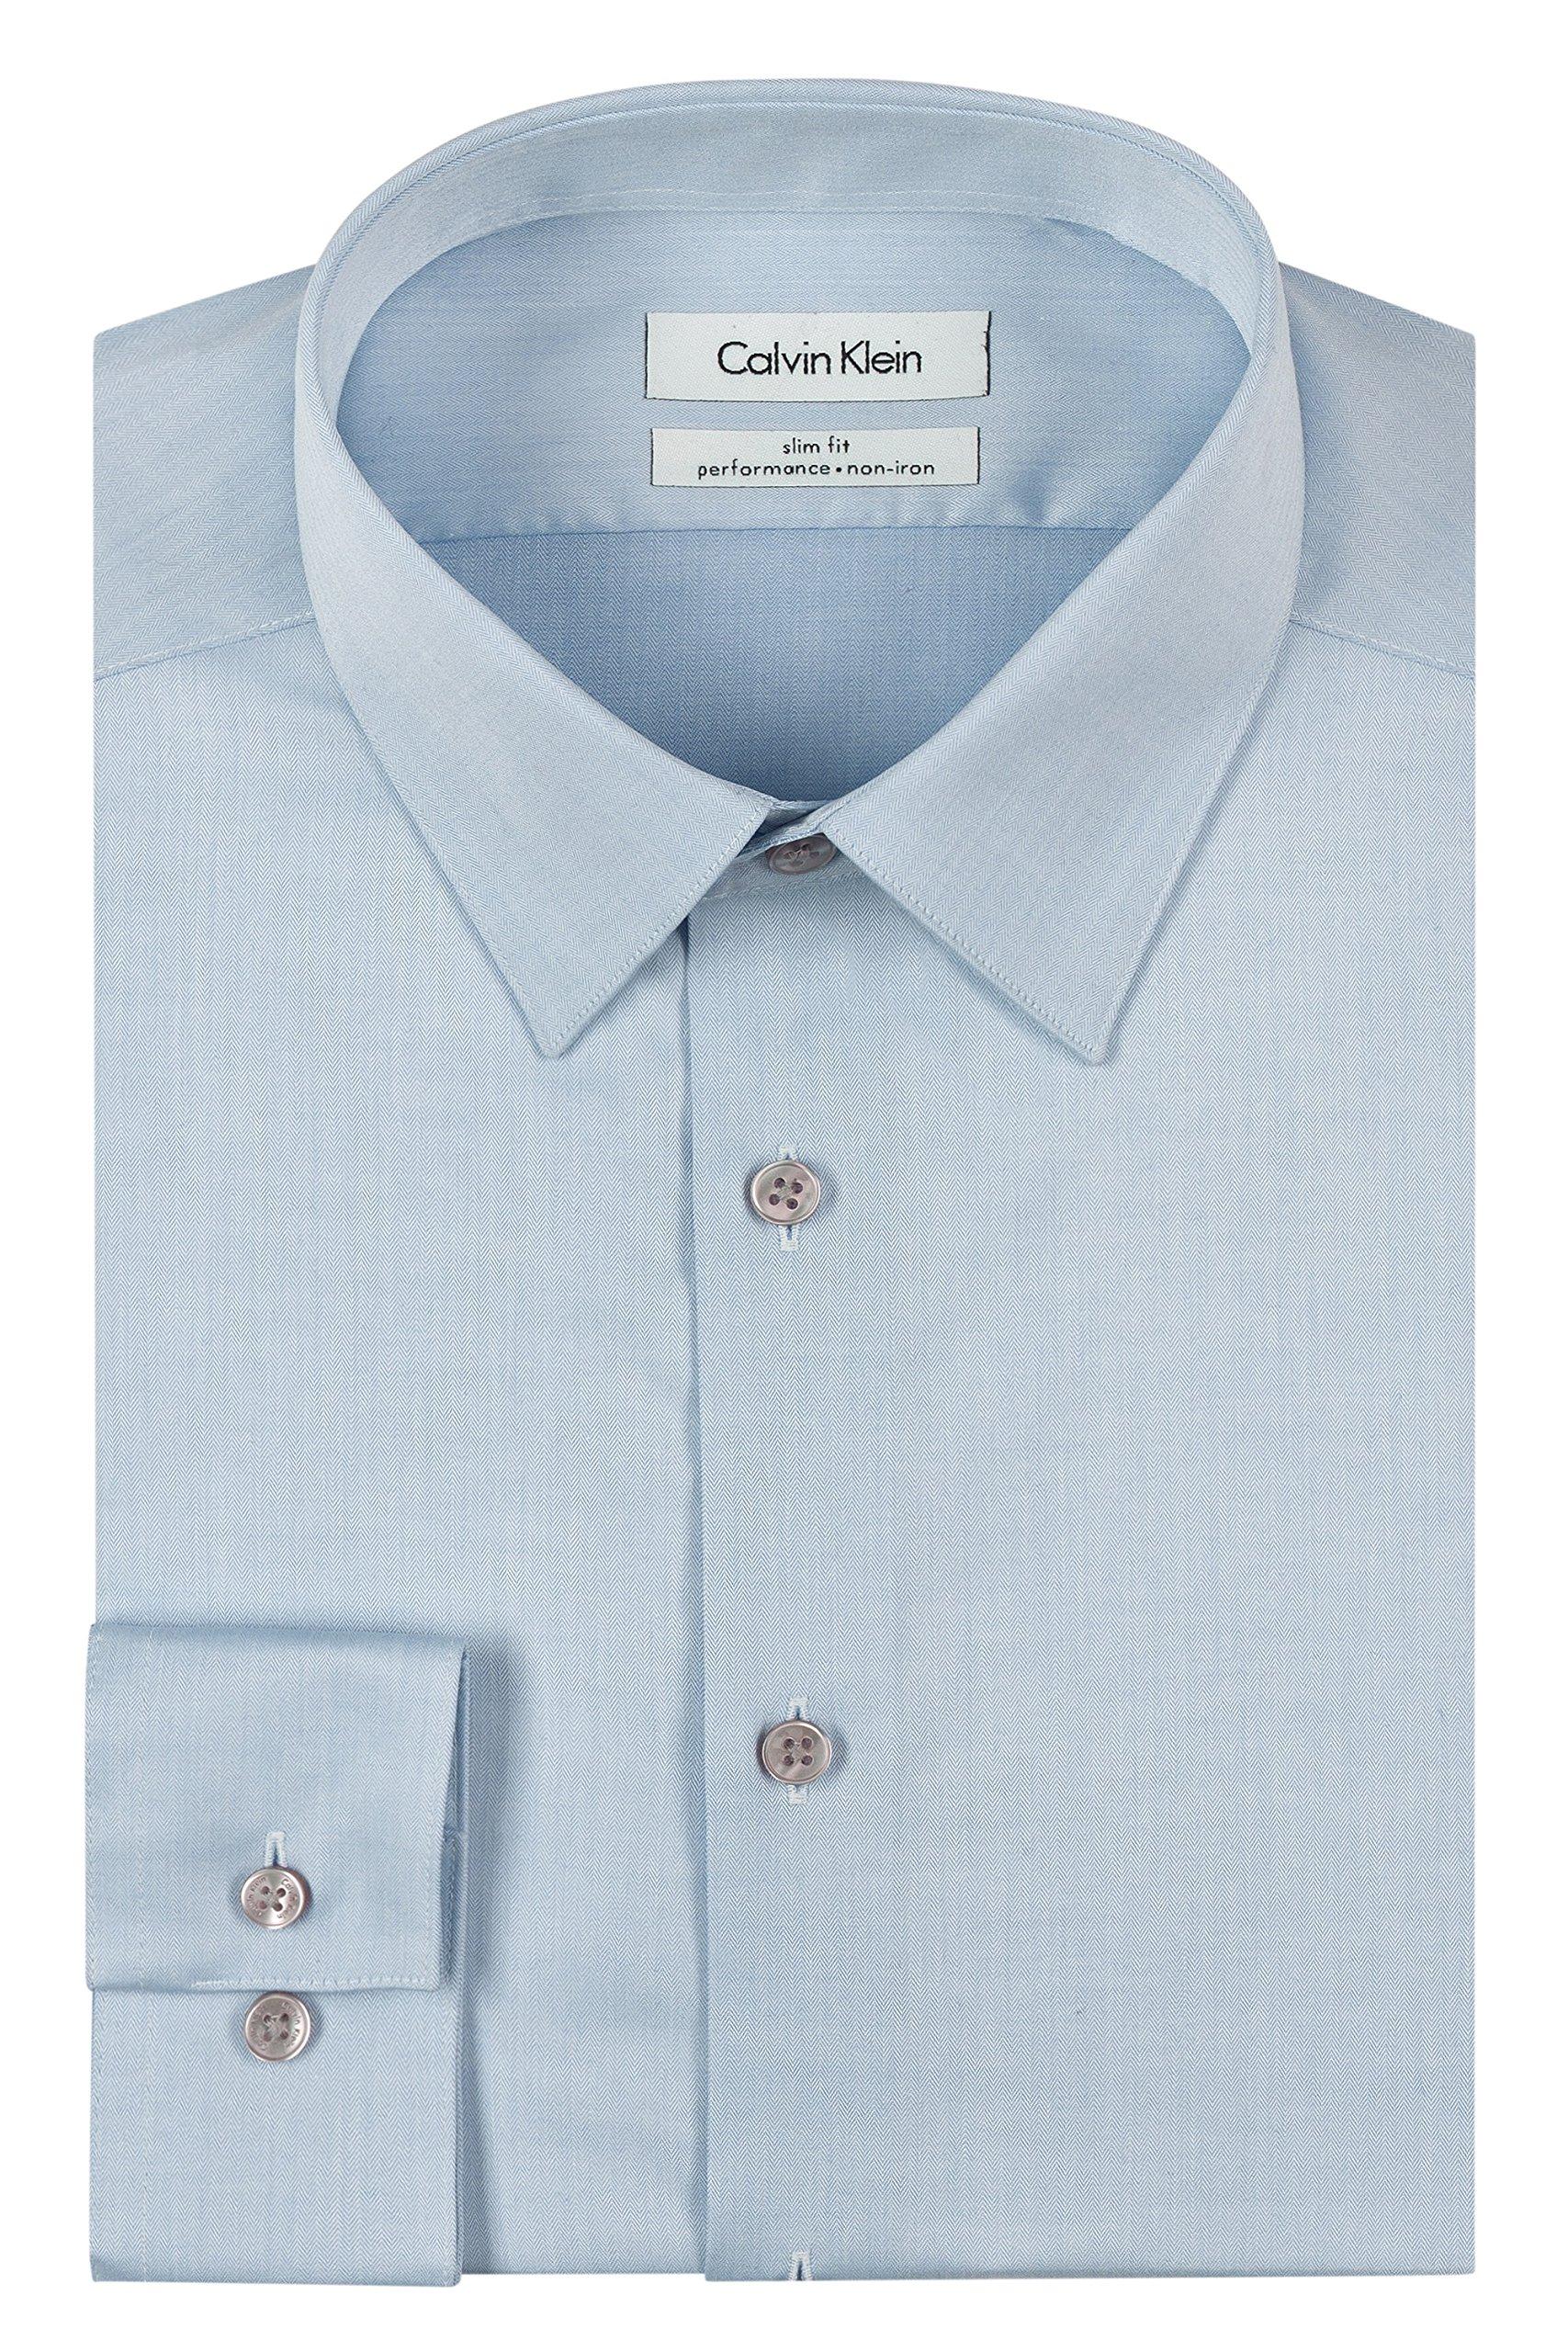 Calvin Klein Men's Dress Shirt Slim Fit Non Iron Herringbone, Blue, 15.5'' Neck 32''-33'' Sleeve